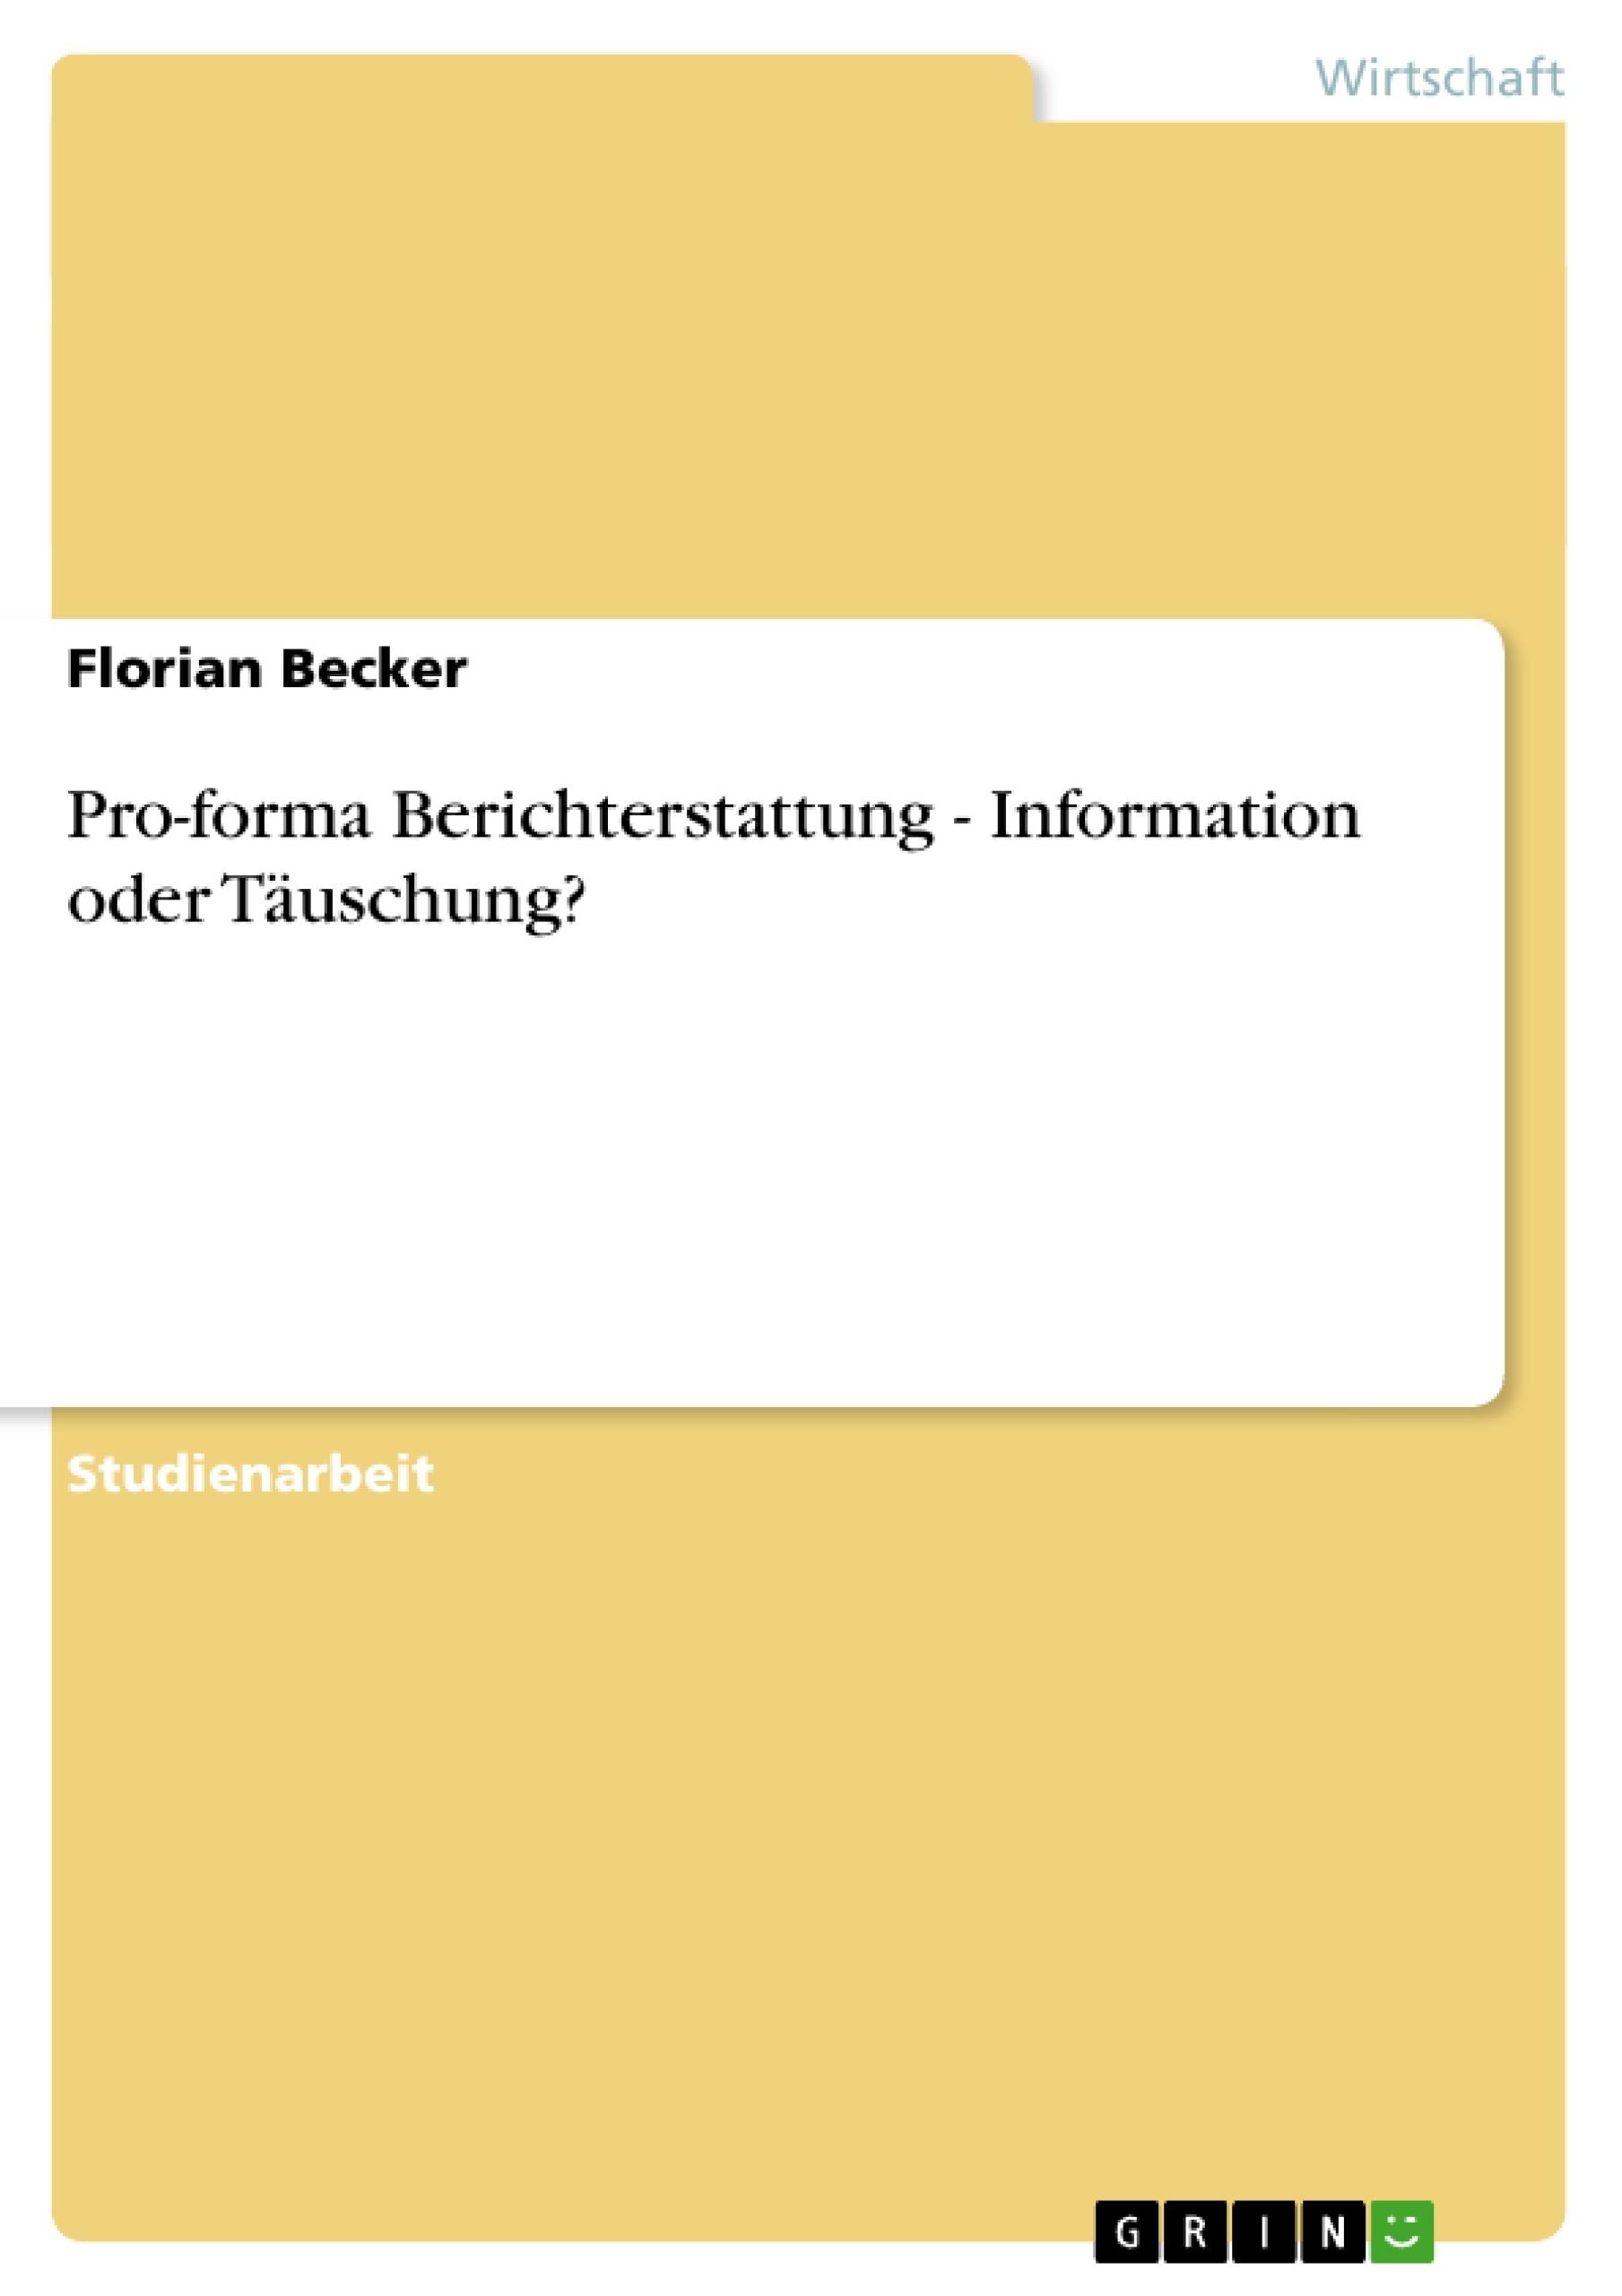 Titel: Pro-forma Berichterstattung - Information oder Täuschung?